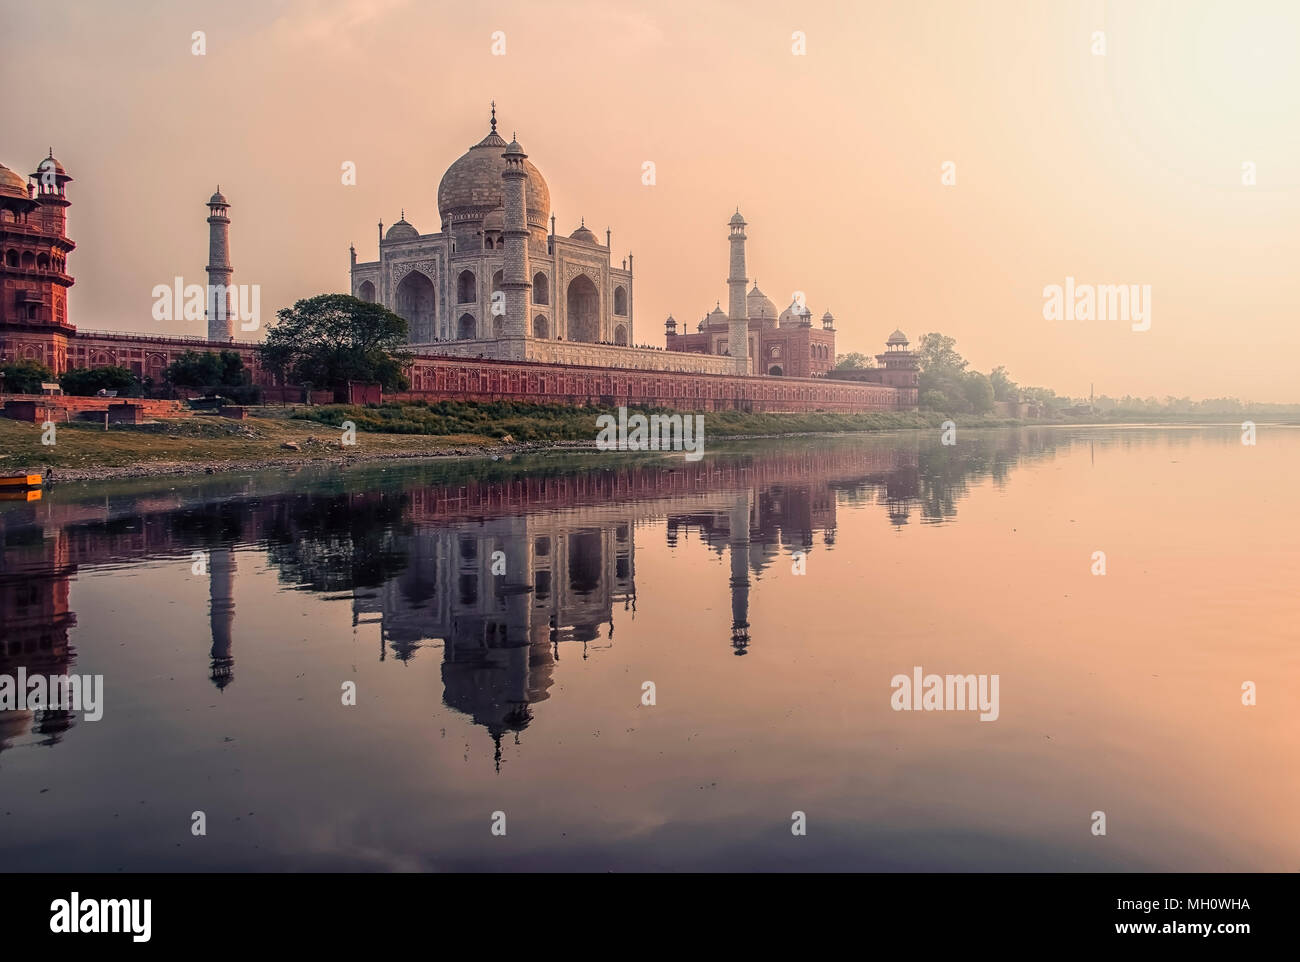 Sonnenuntergang über das Taj Mahal, Agra, Indien Stockbild